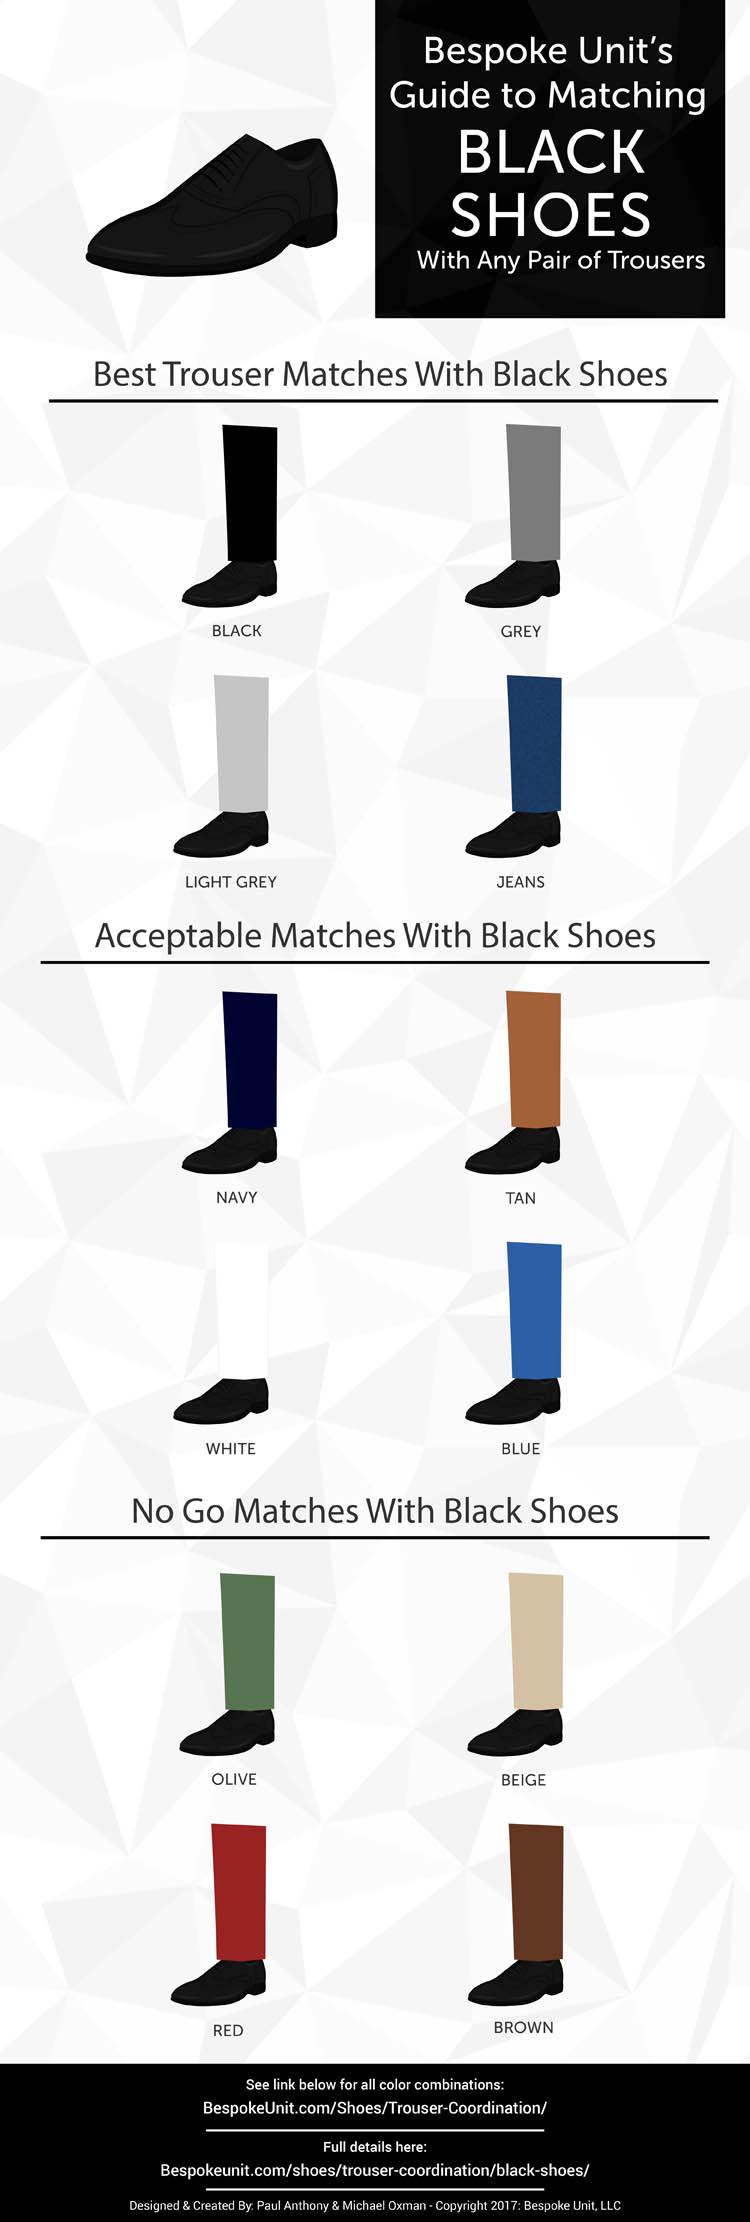 Black-Shoes-Coordination-Graphic